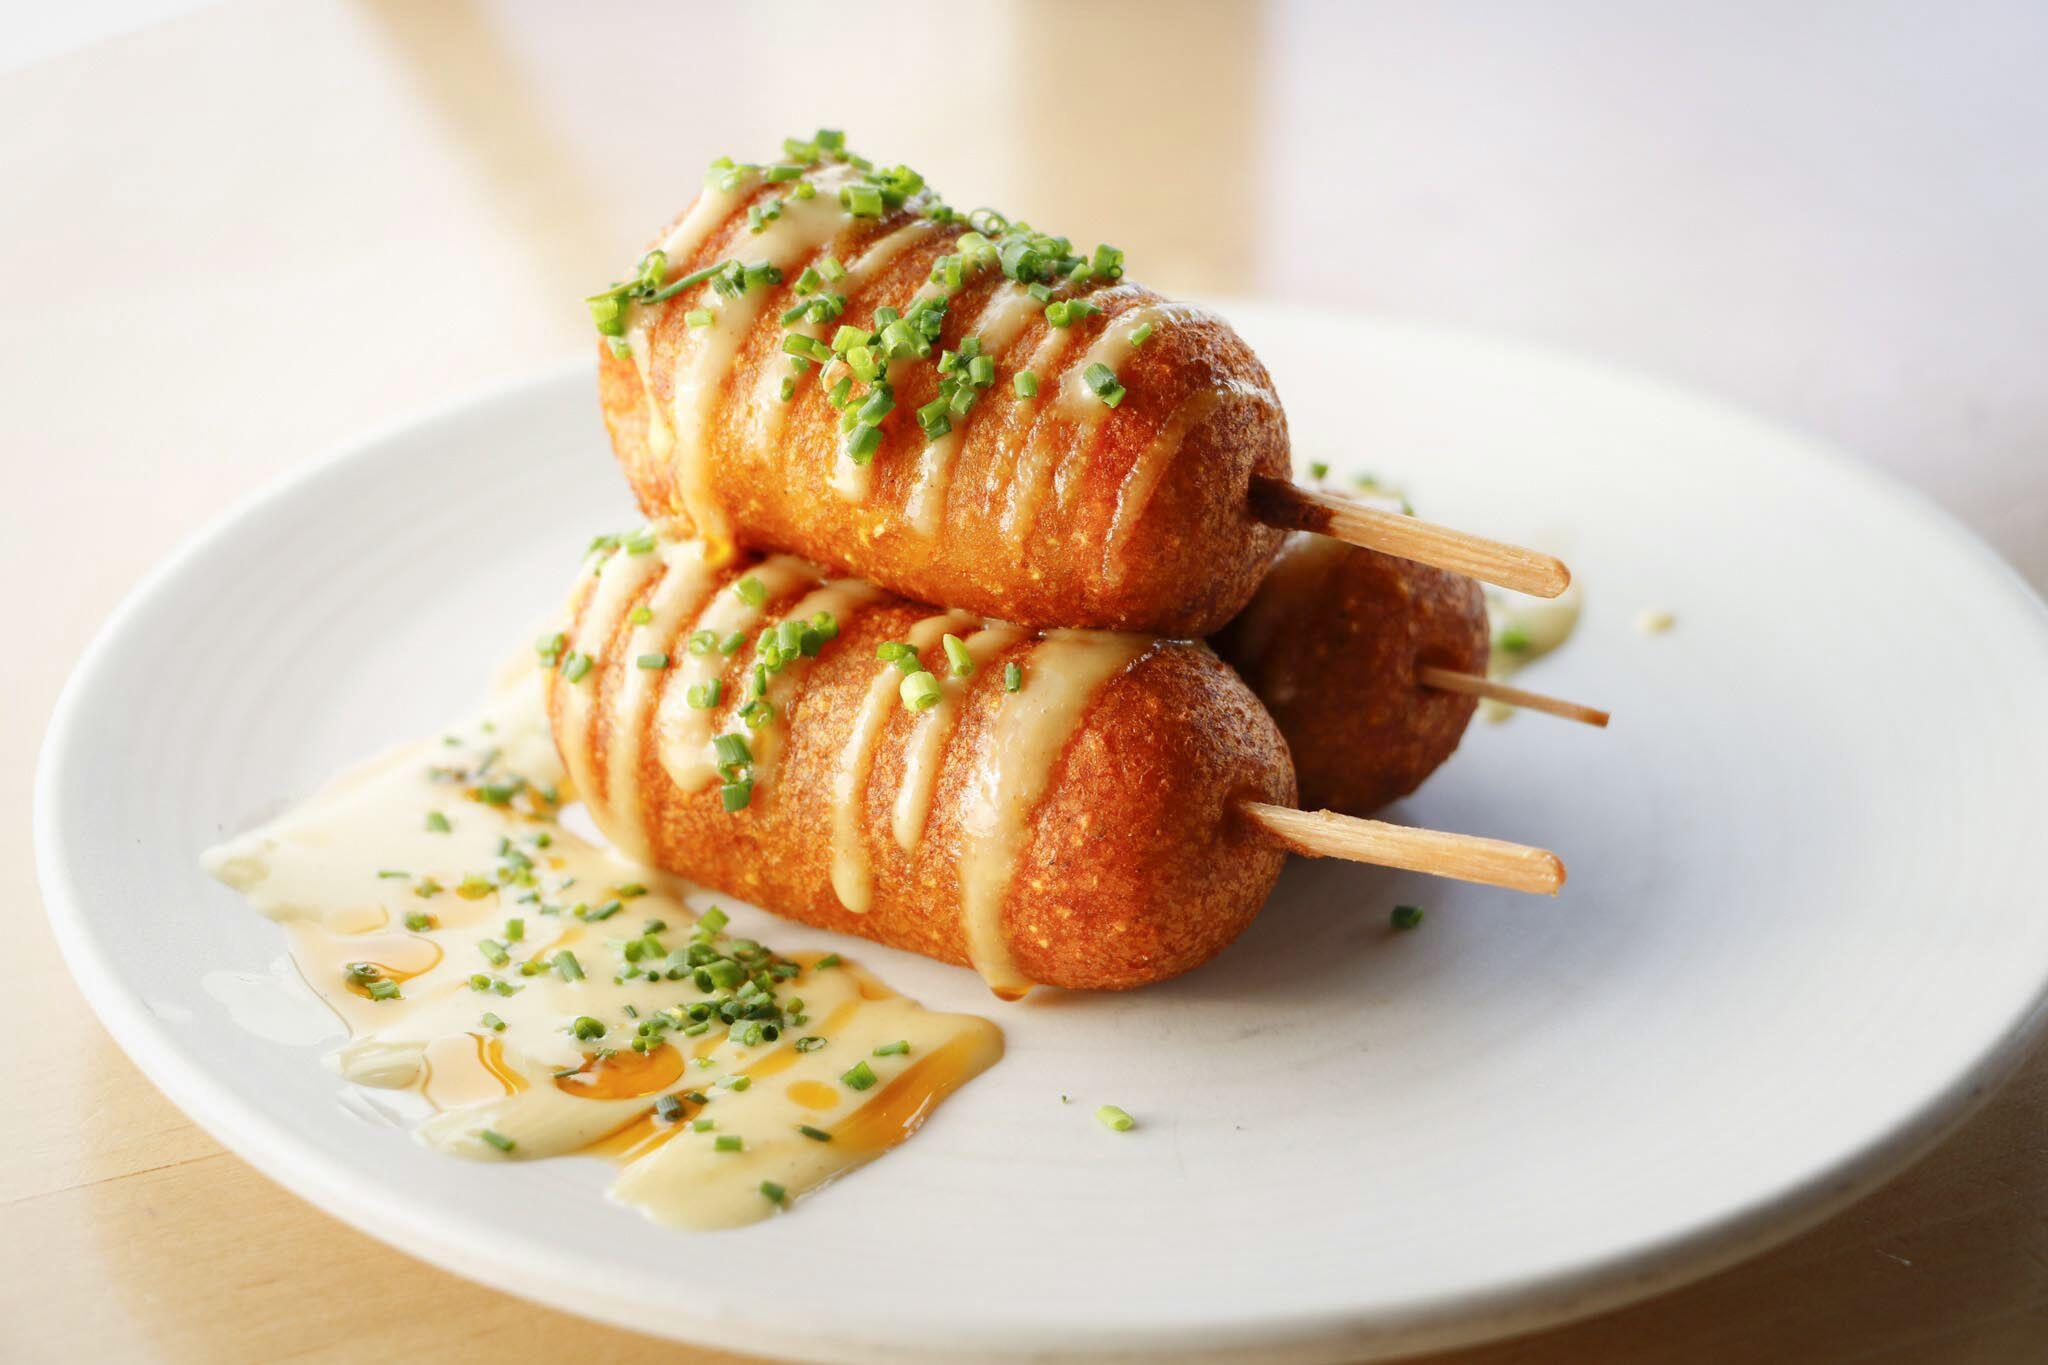 5 Jenis Korean Hot Dog yang Hits Banget, Wajib Coba Satu-satu!